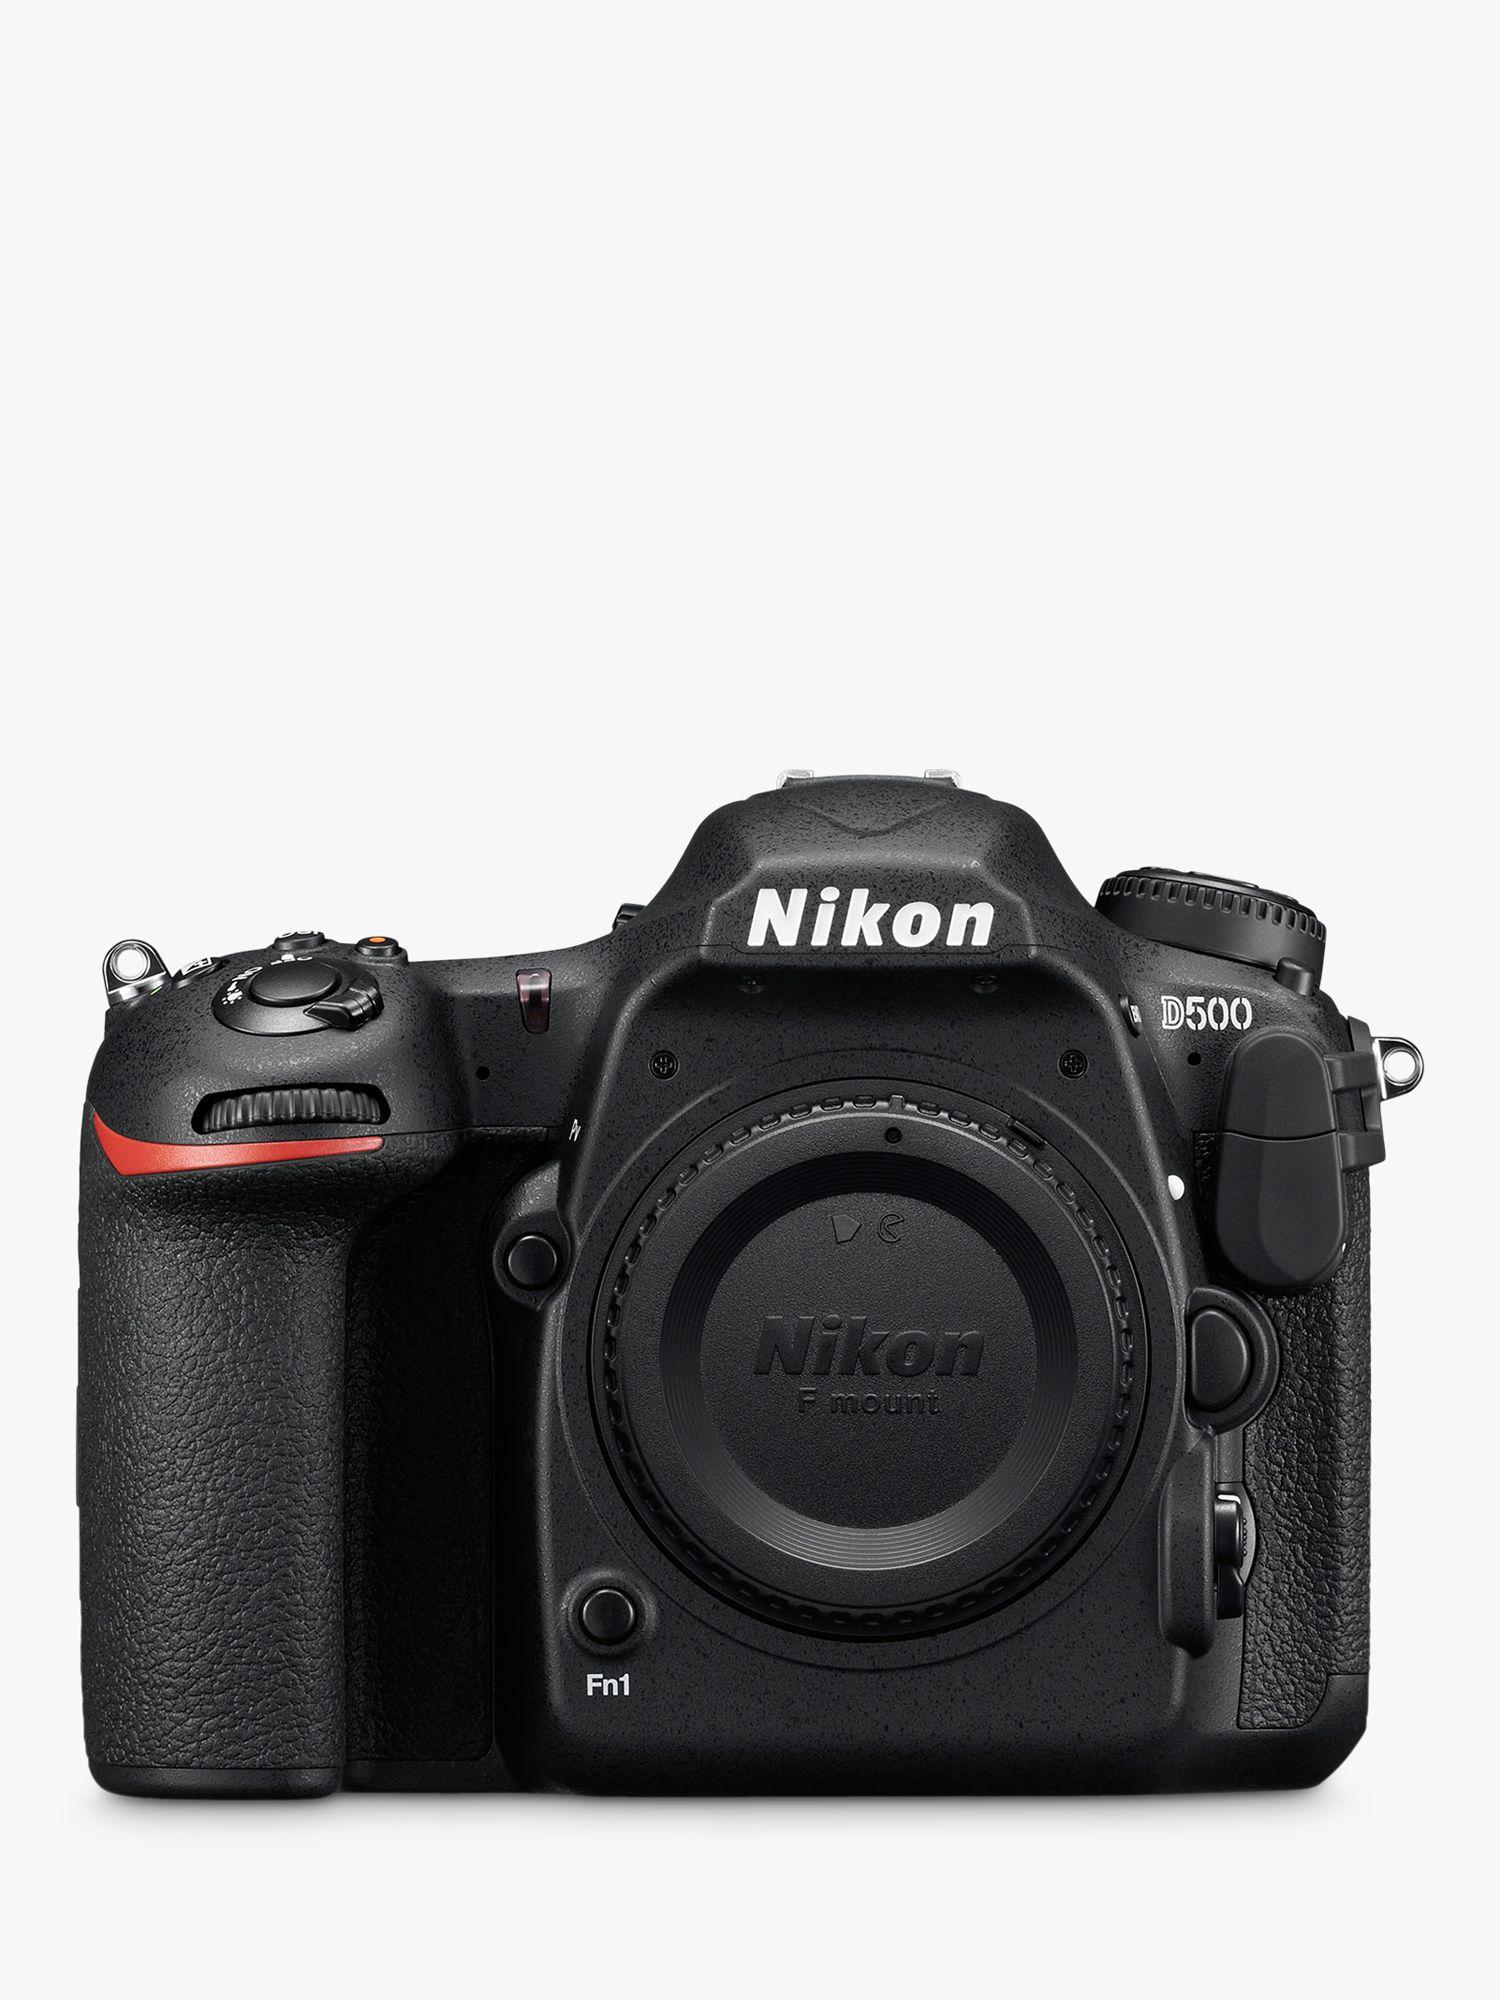 Nikon Nikon DX D500 Digital SLR Camera, 4K Ultra HD, 20.9MP, Wi-Fi/Bluetooth/NFC With 3.2 Tiltable Touch Screen, Black, Body Only